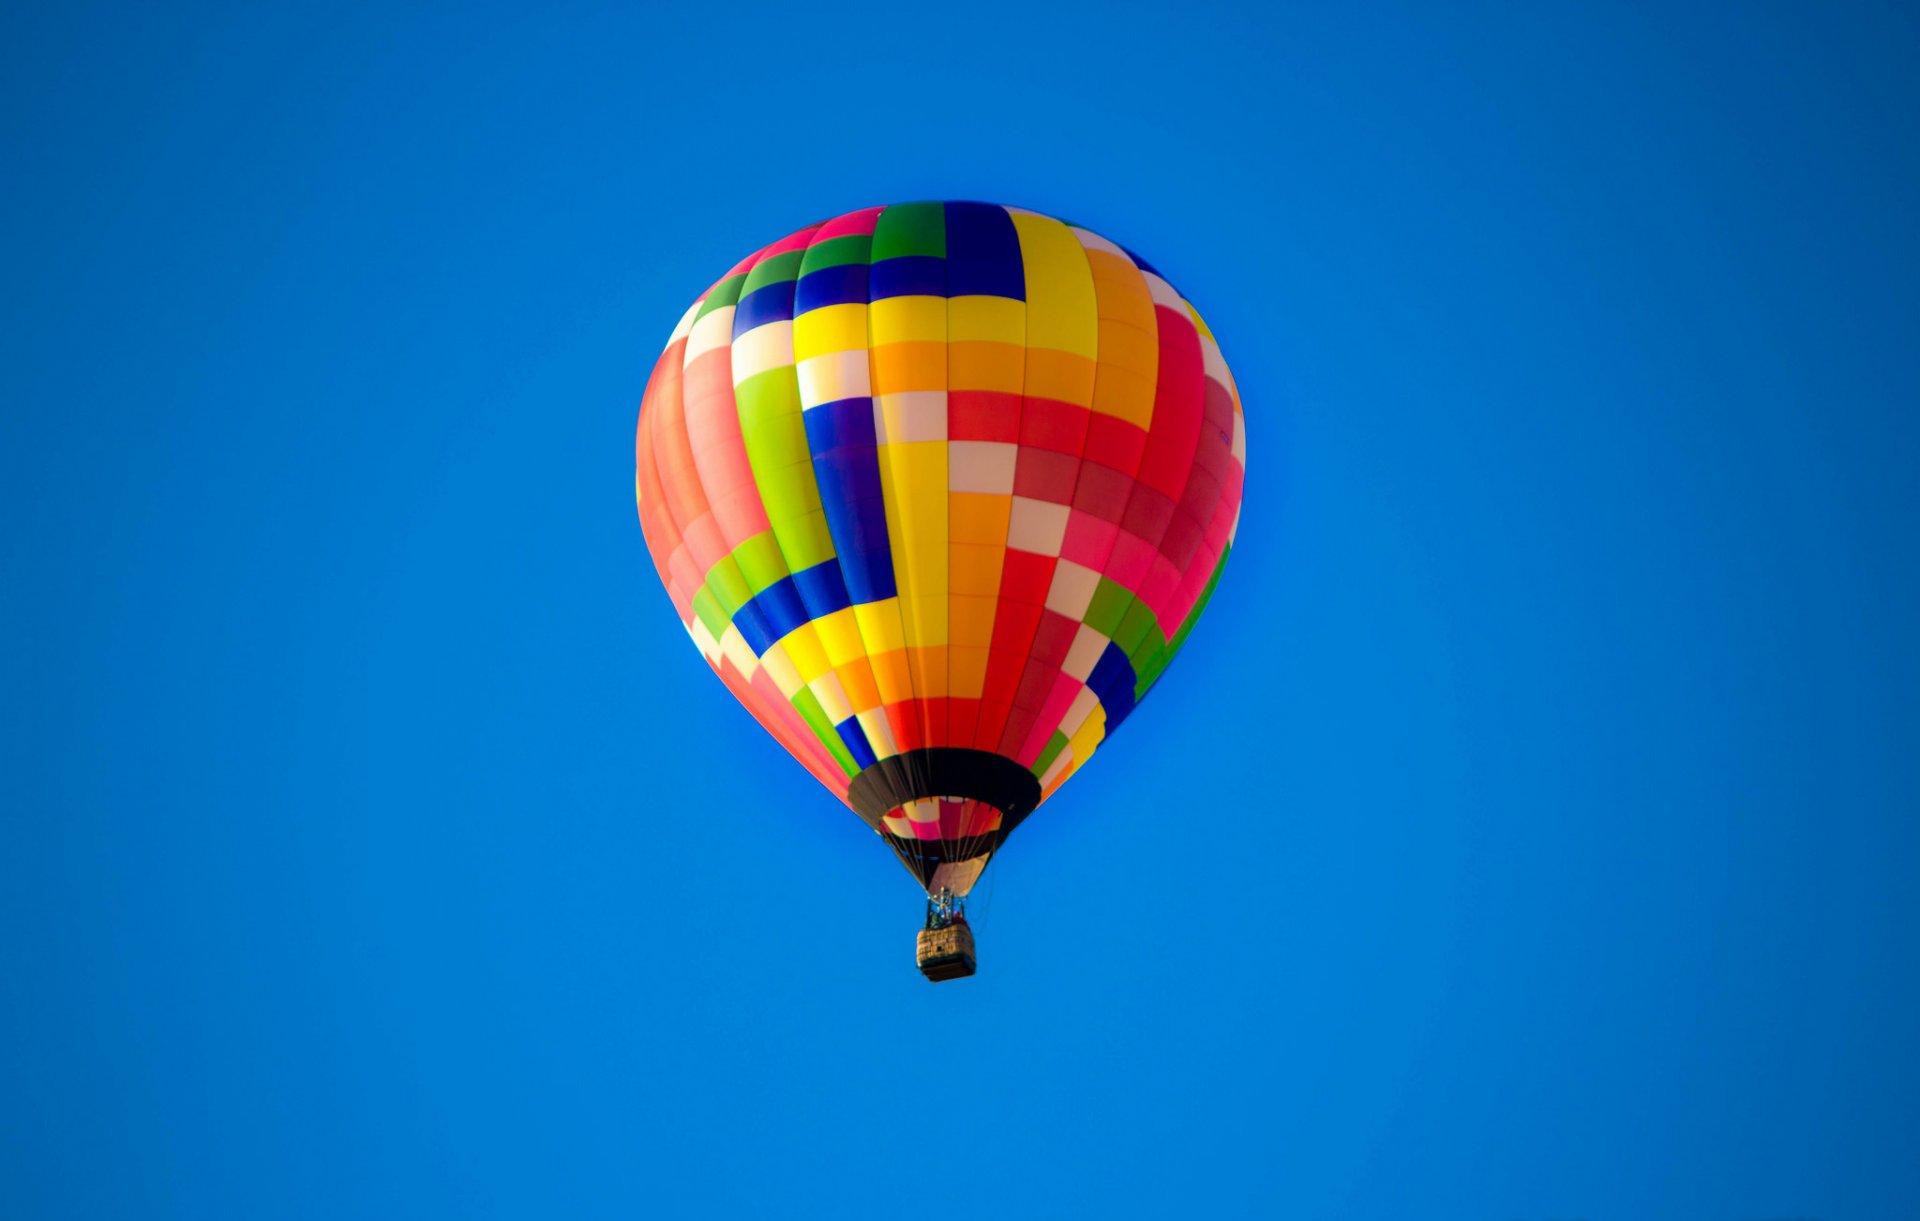 Обои воздушный шар, корзина. Авиация foto 12